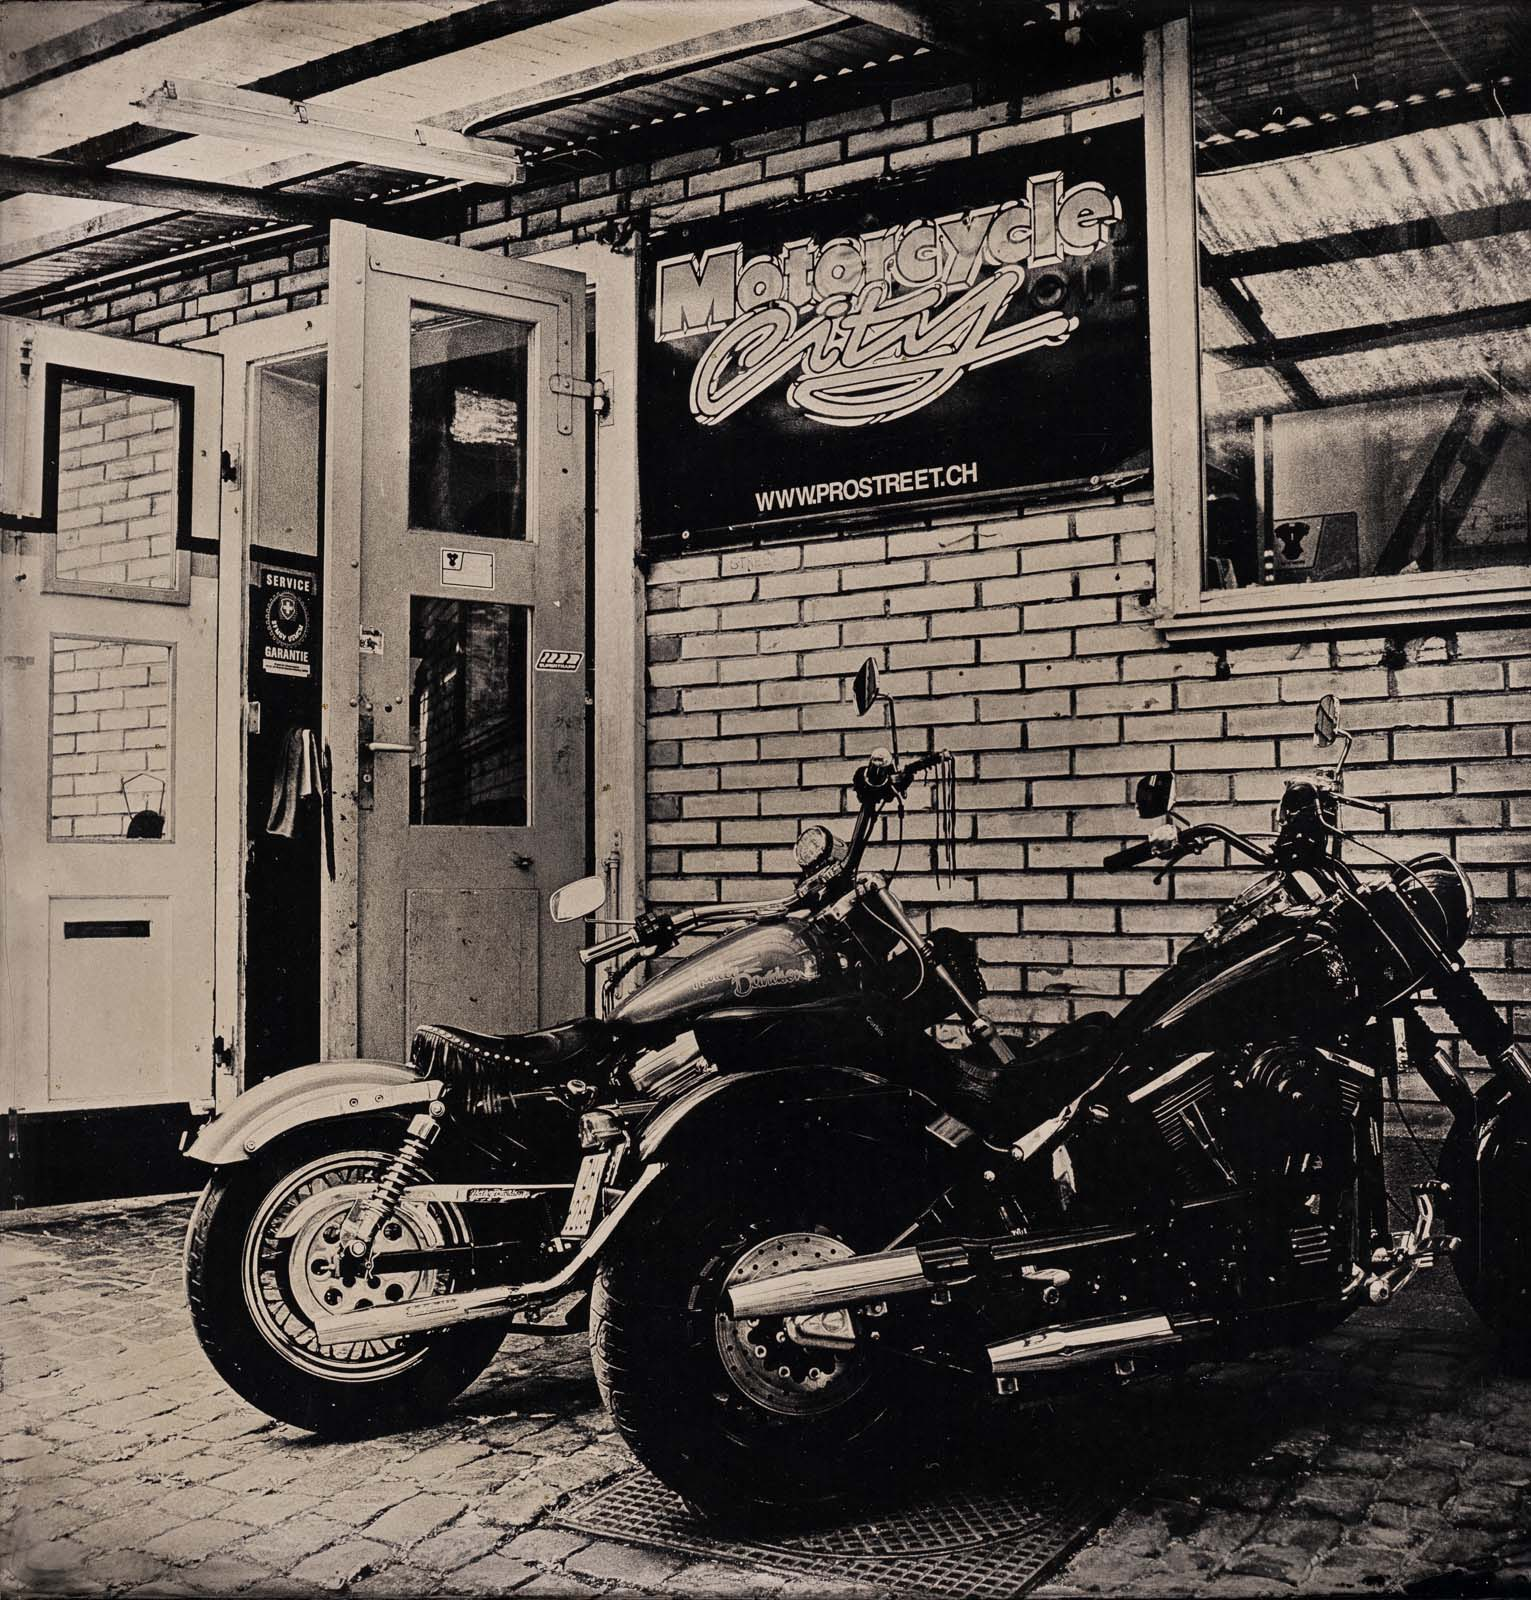 Motorcyclecity Courtyard - By:Marius Kurek